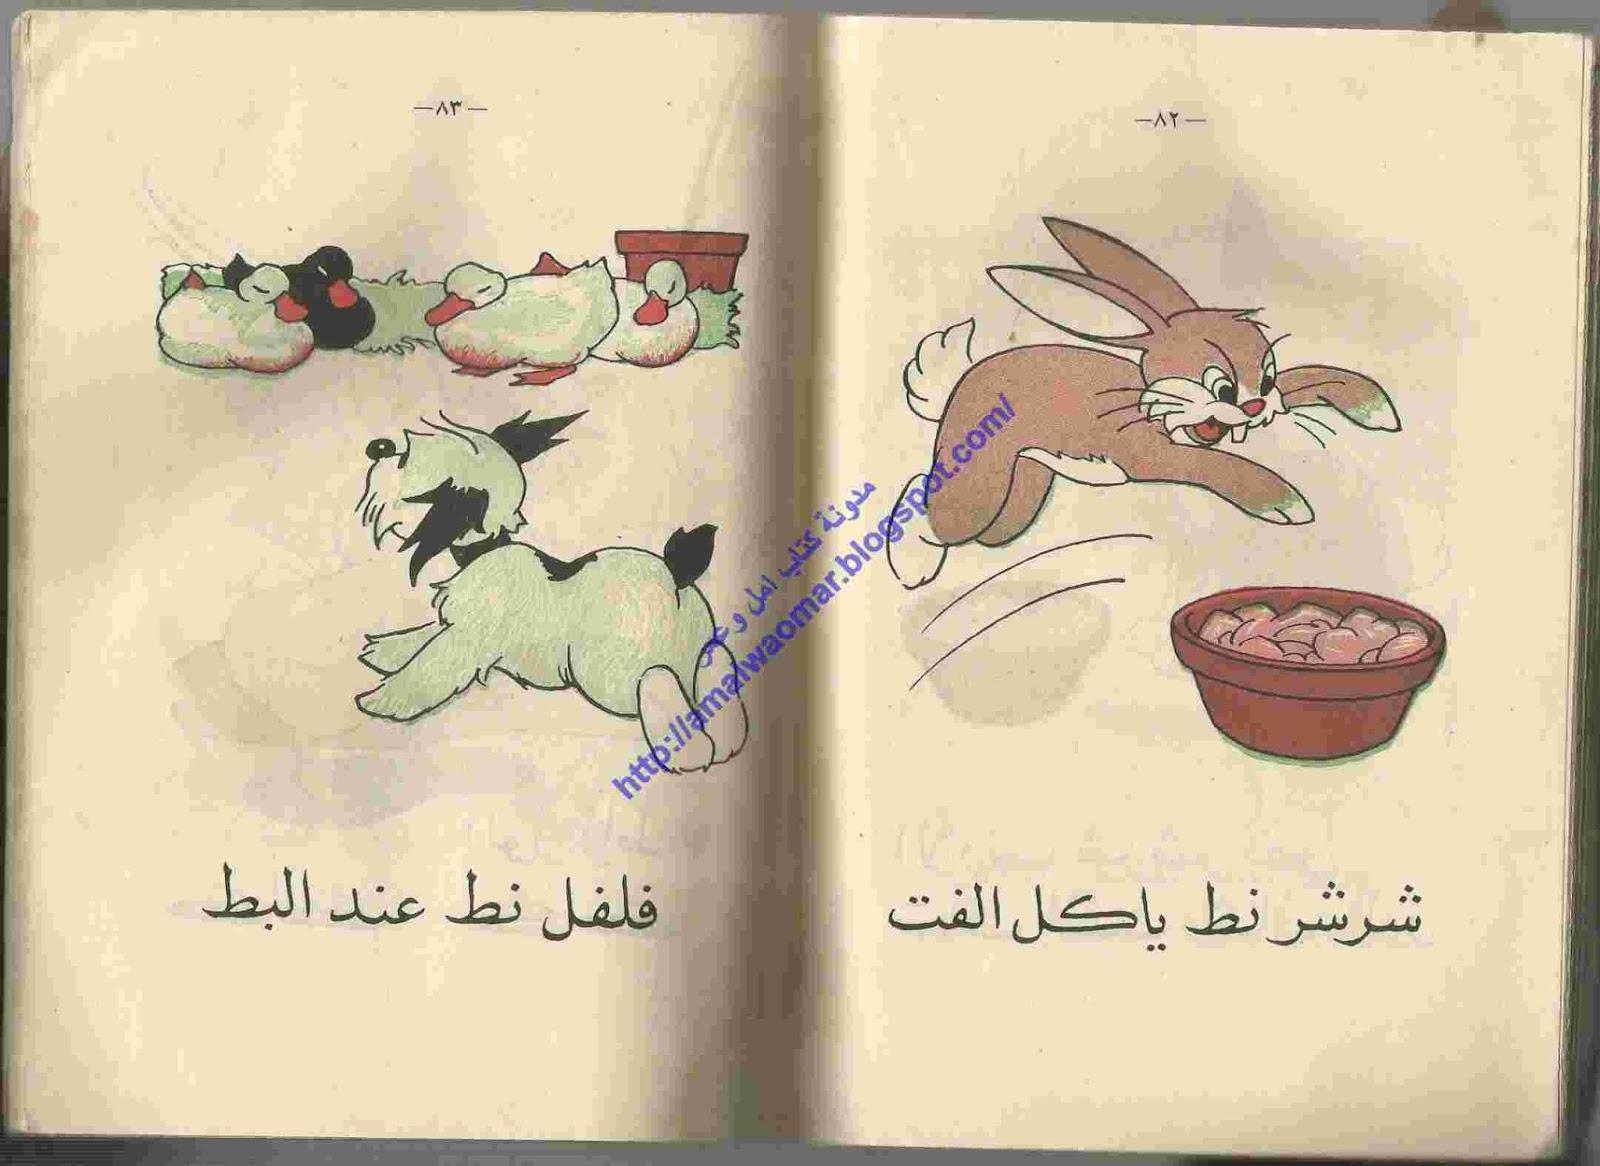 كتاب فلفل وشرشر